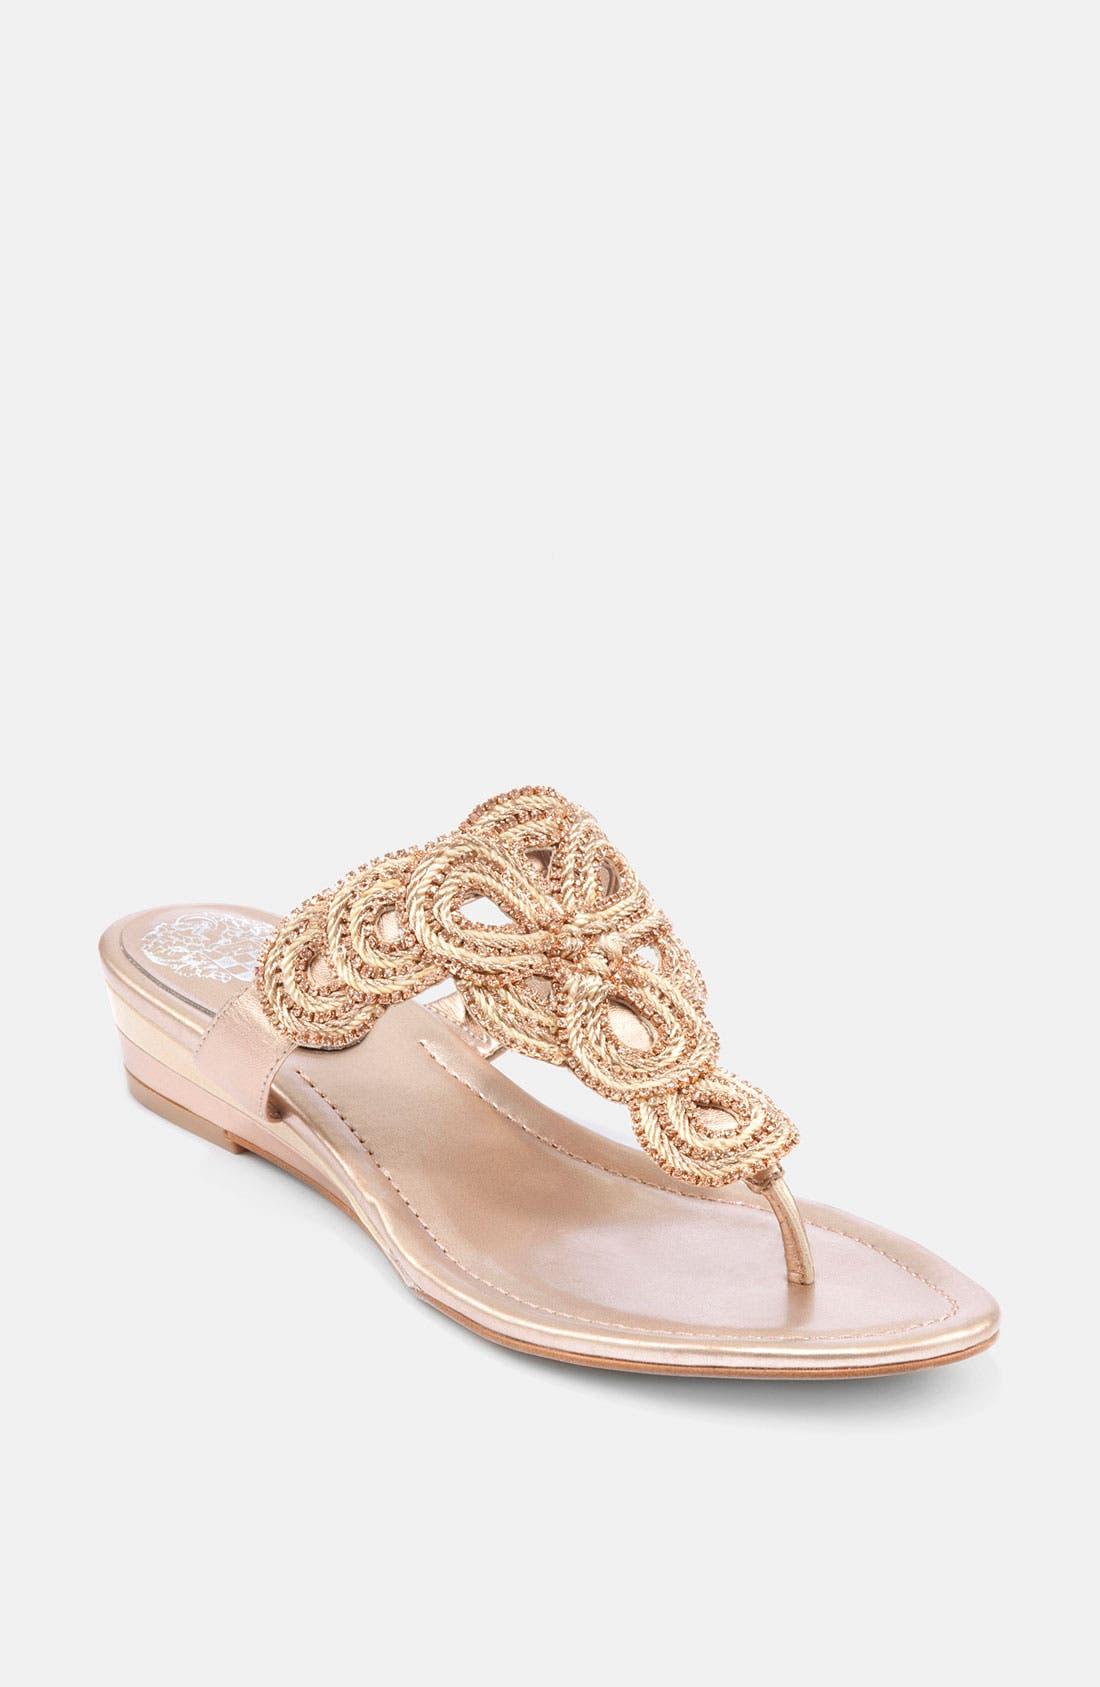 Main Image - Vince Camuto 'Idan' Sandal